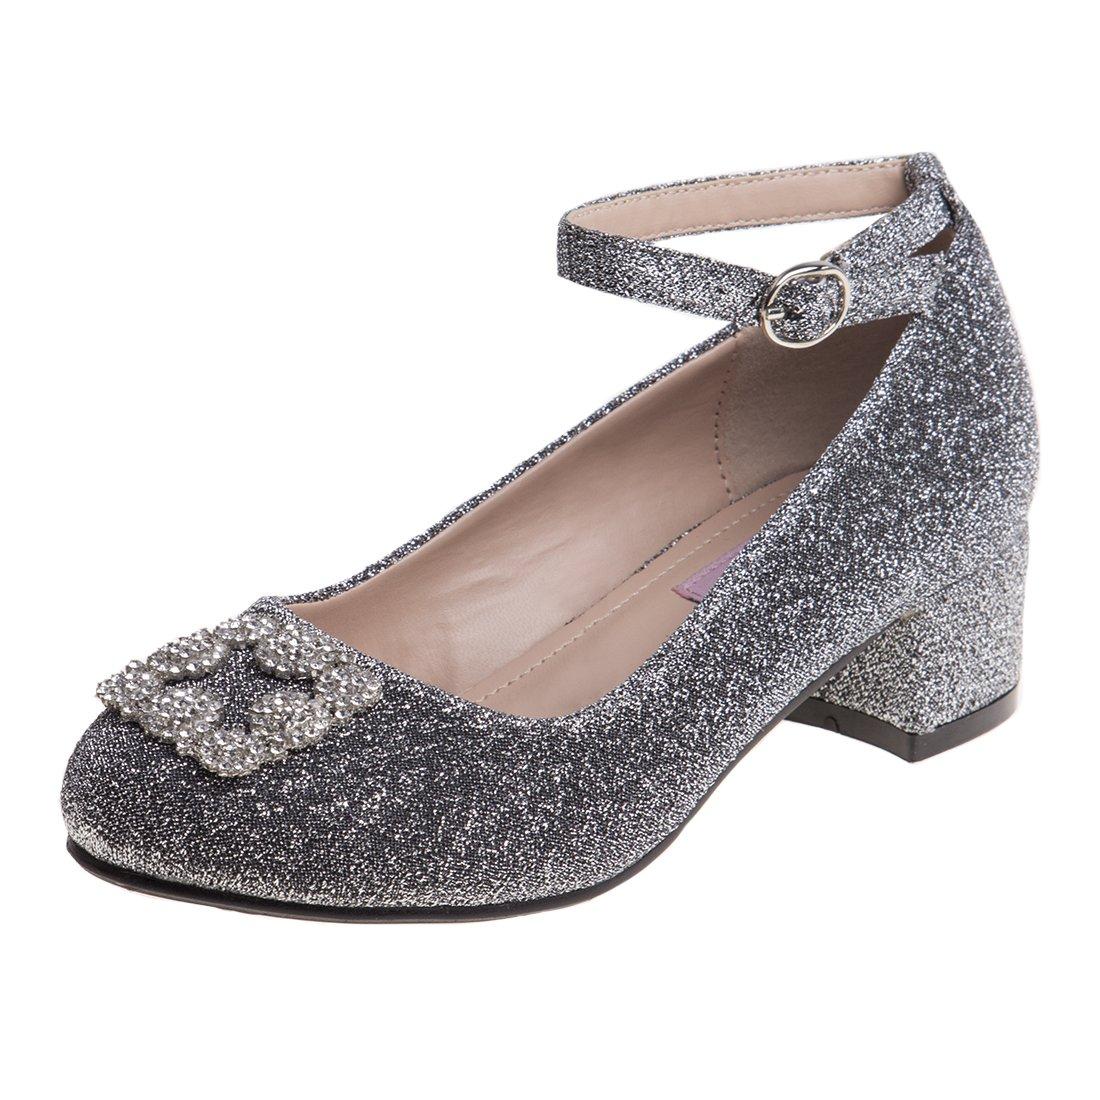 Nanette Lepore Girls Glitter Mesh Dress Block Heel Shoes with Rhinestone Buckle (Little Kid/Big Kid)